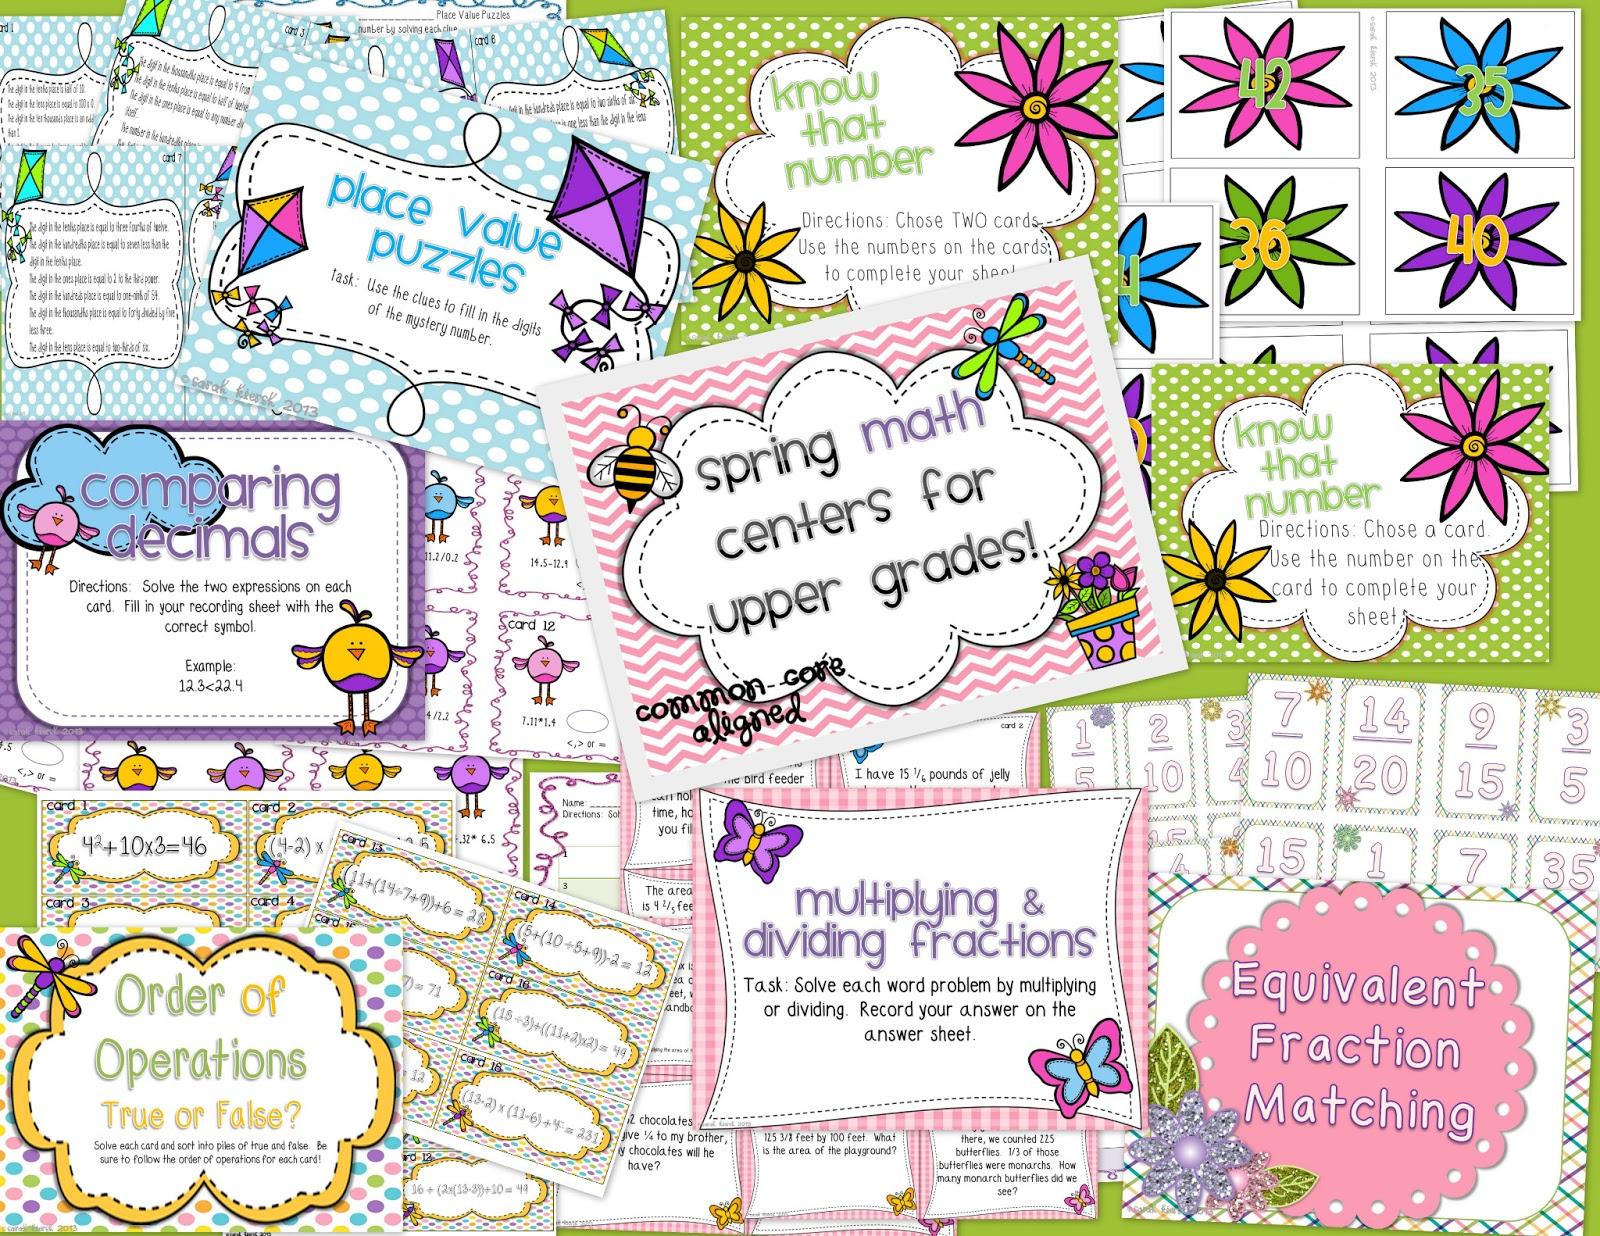 Superstar Math Worksheet   Printable Worksheets and Activities for  Teachers [ 1236 x 1600 Pixel ]